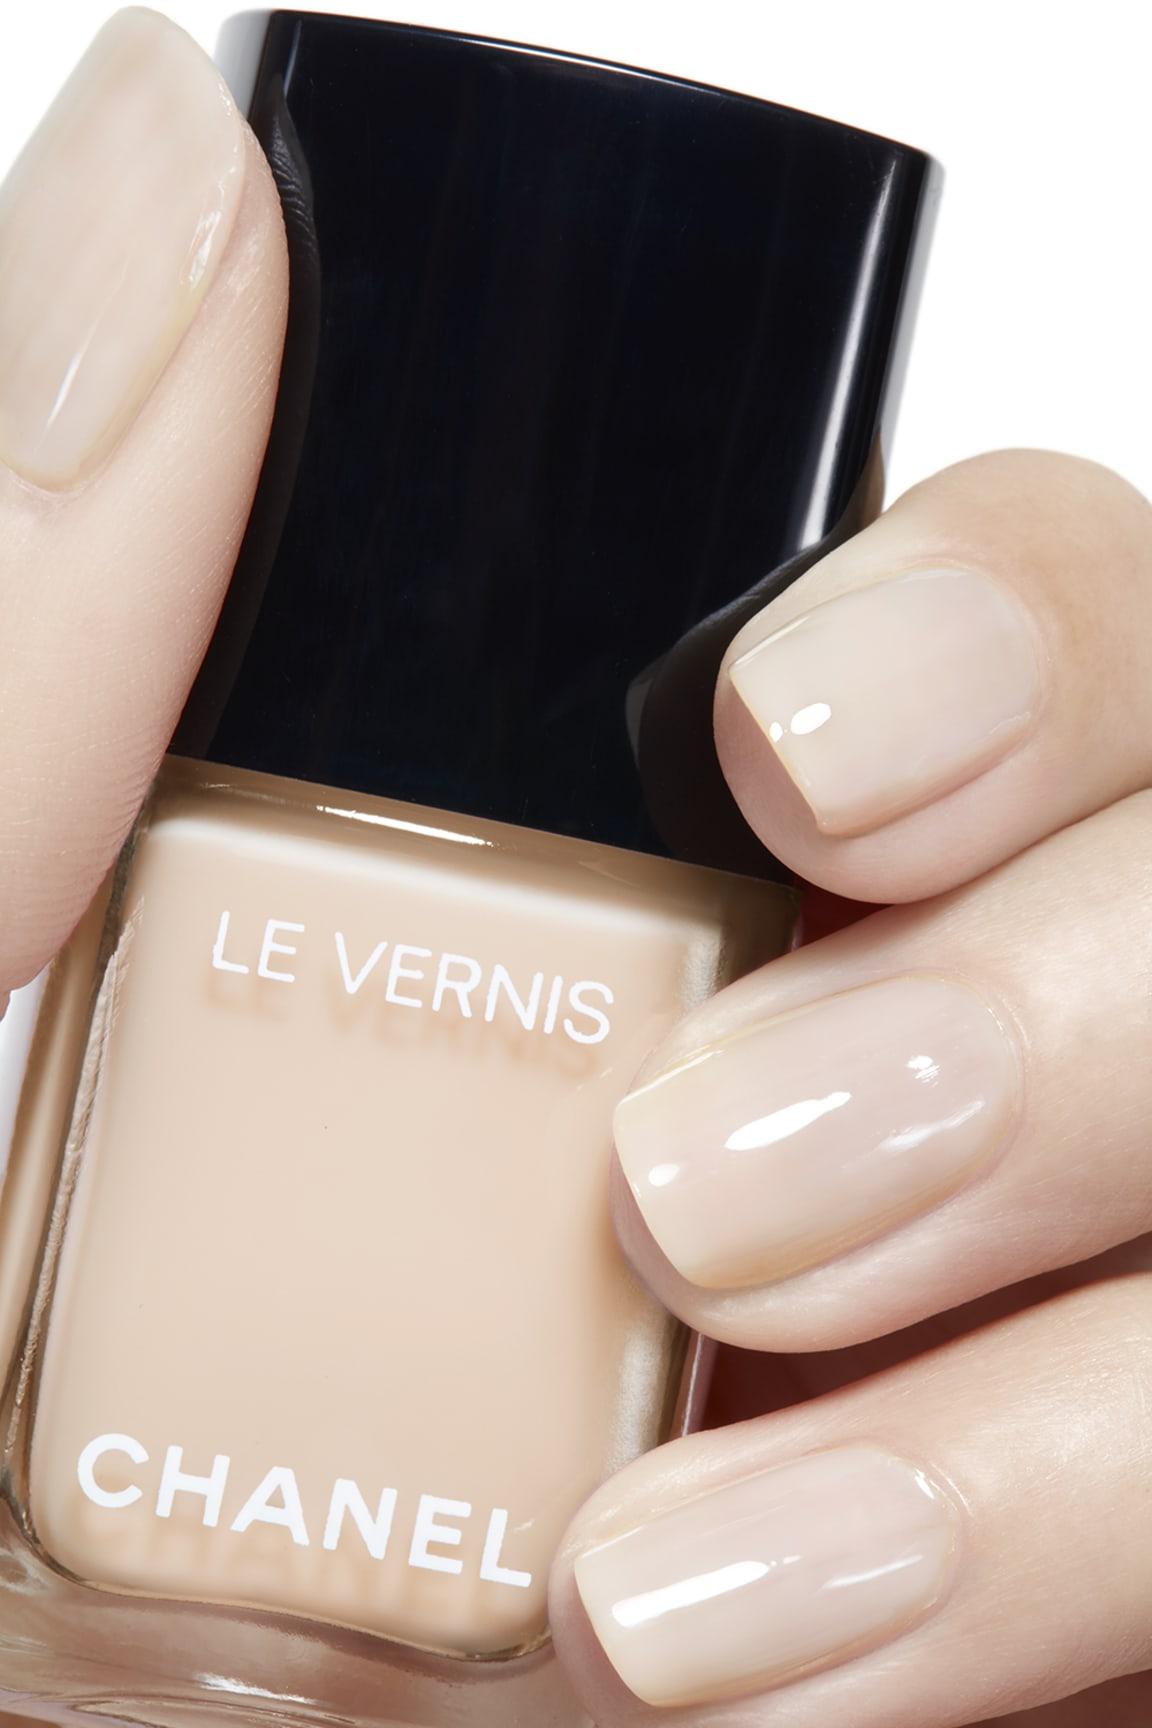 Application makeup visual 2 - LE VERNIS 548 - BLANC WHITE